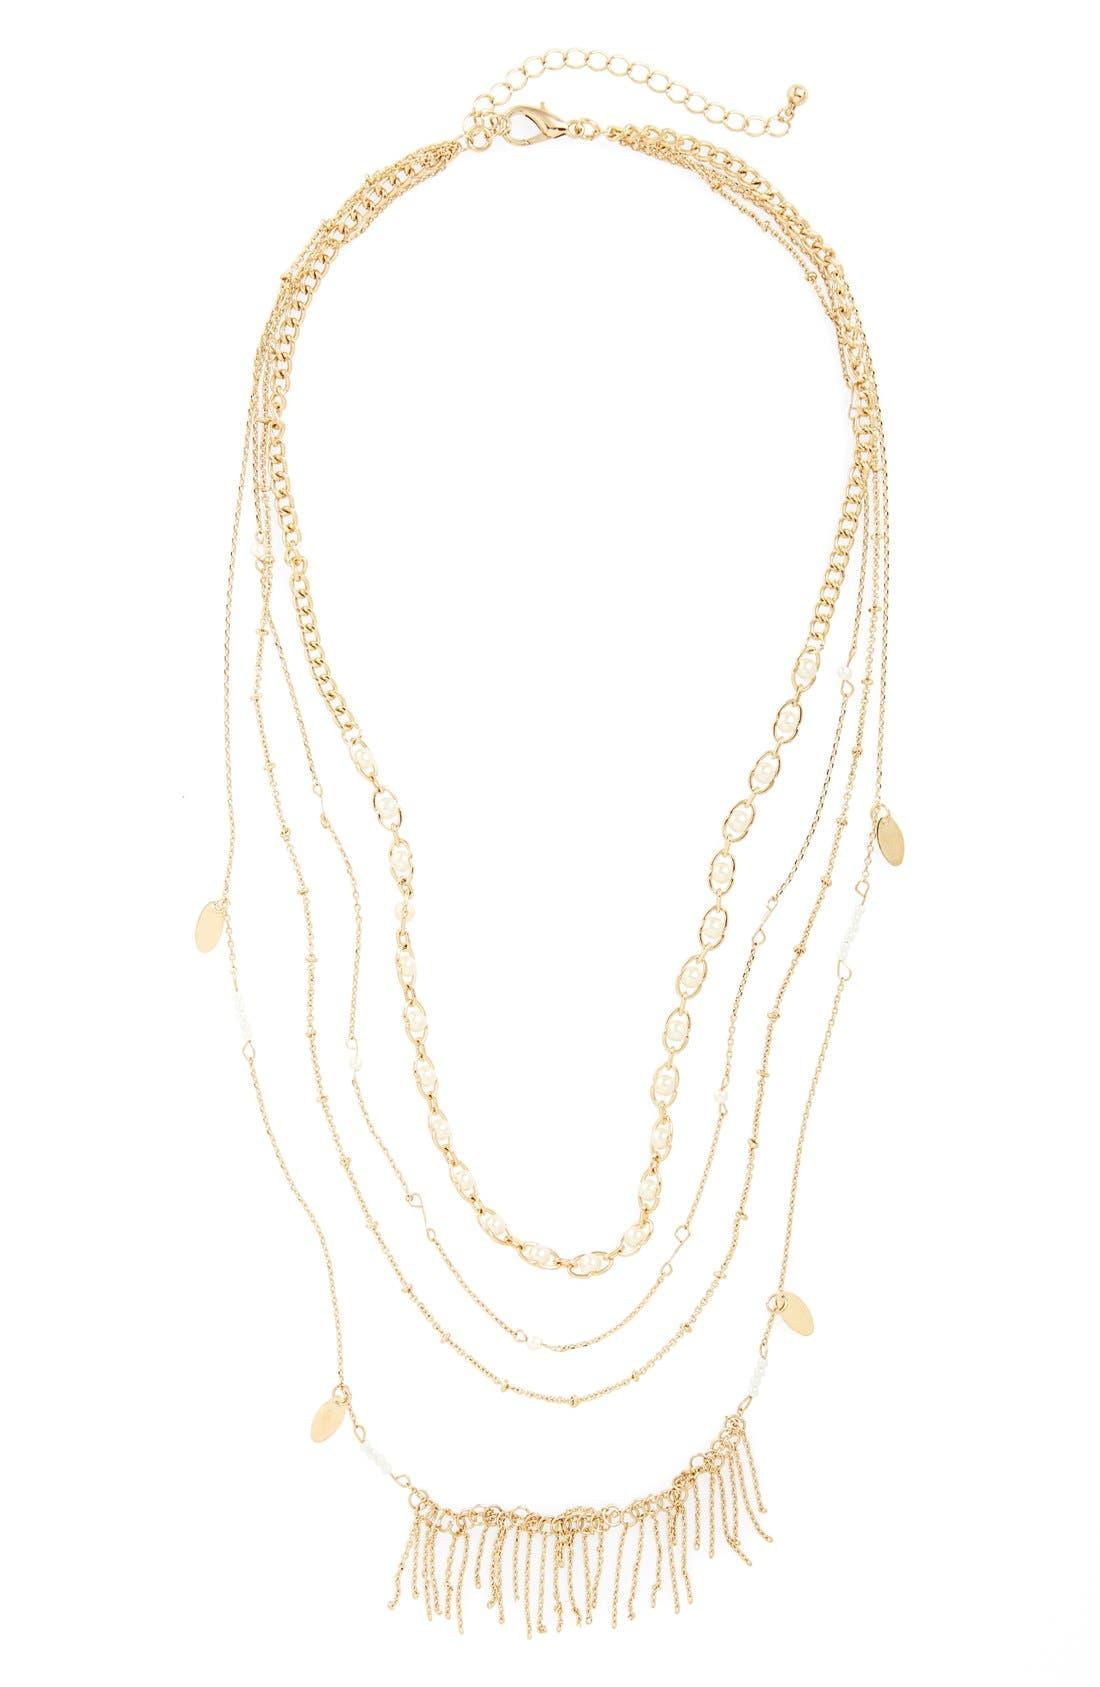 Alternate Image 1 Selected - Panacea Faux Pearl & Fringe Layered Necklace